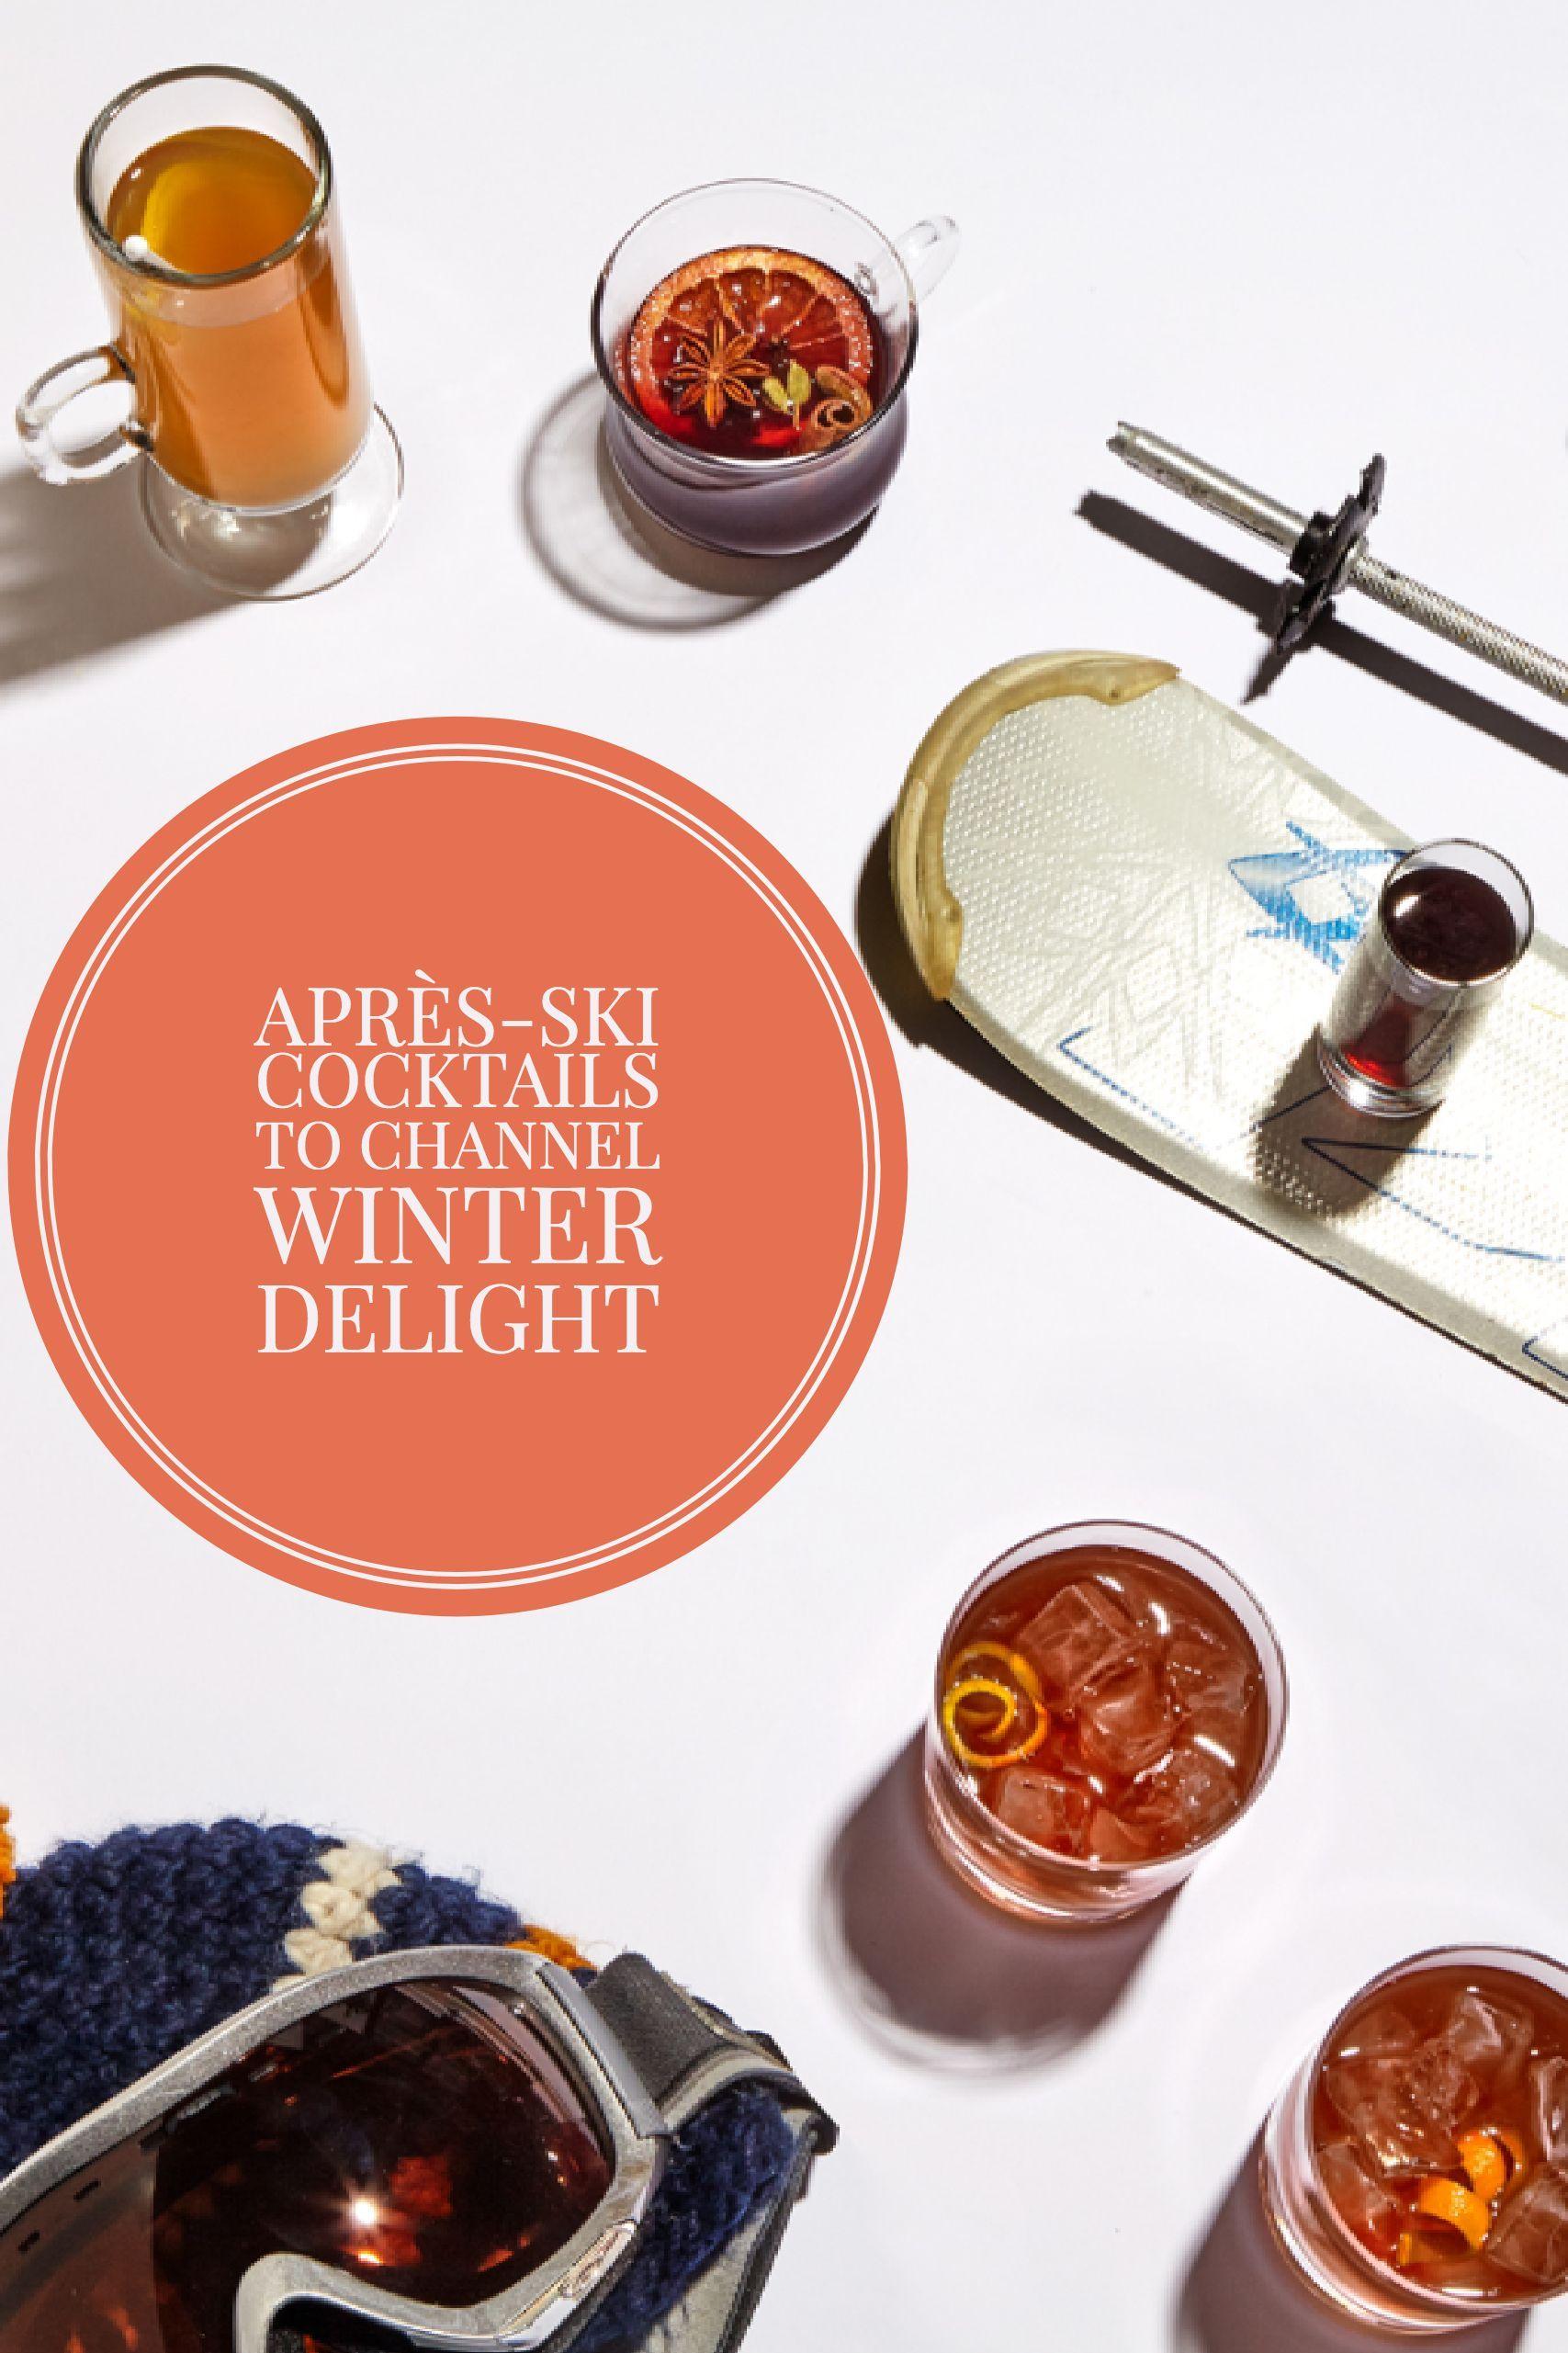 AprèsSki Cocktails to Channel Winter Delight Wine